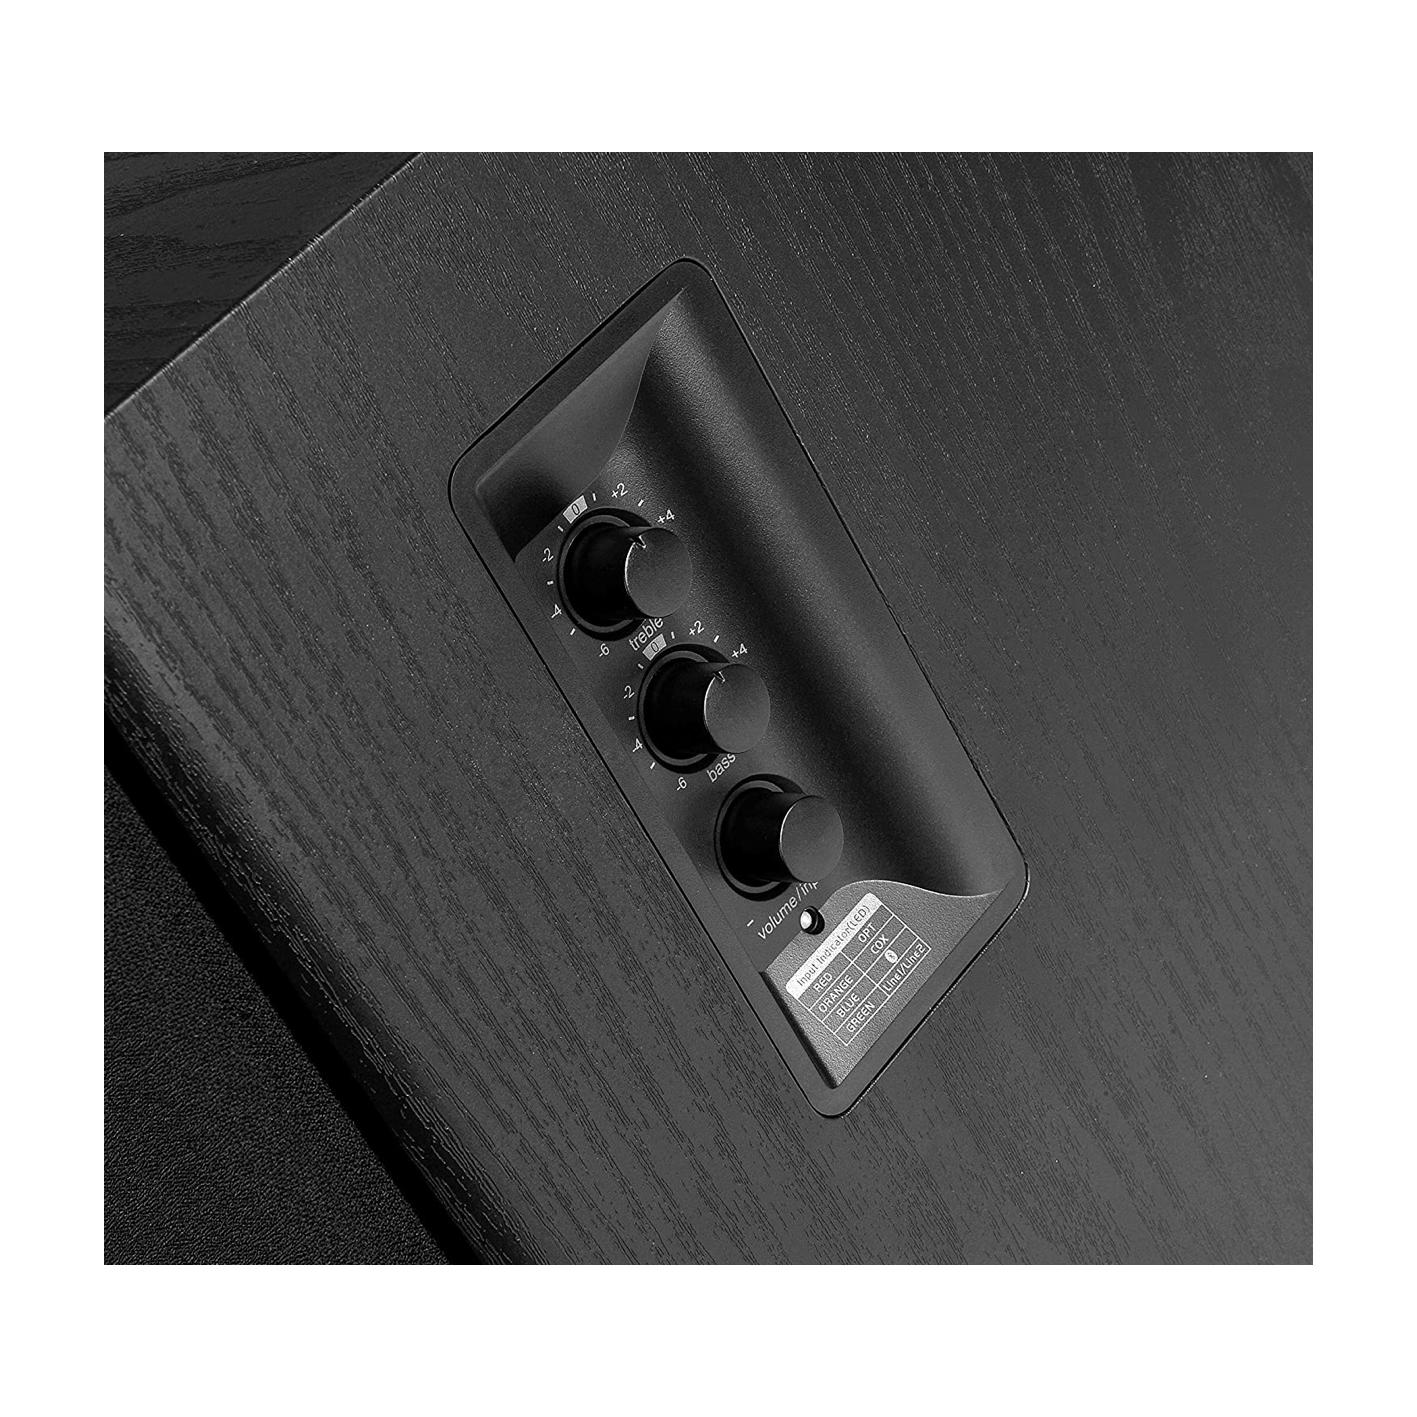 Edifier R2750 Studio Monitor System Black